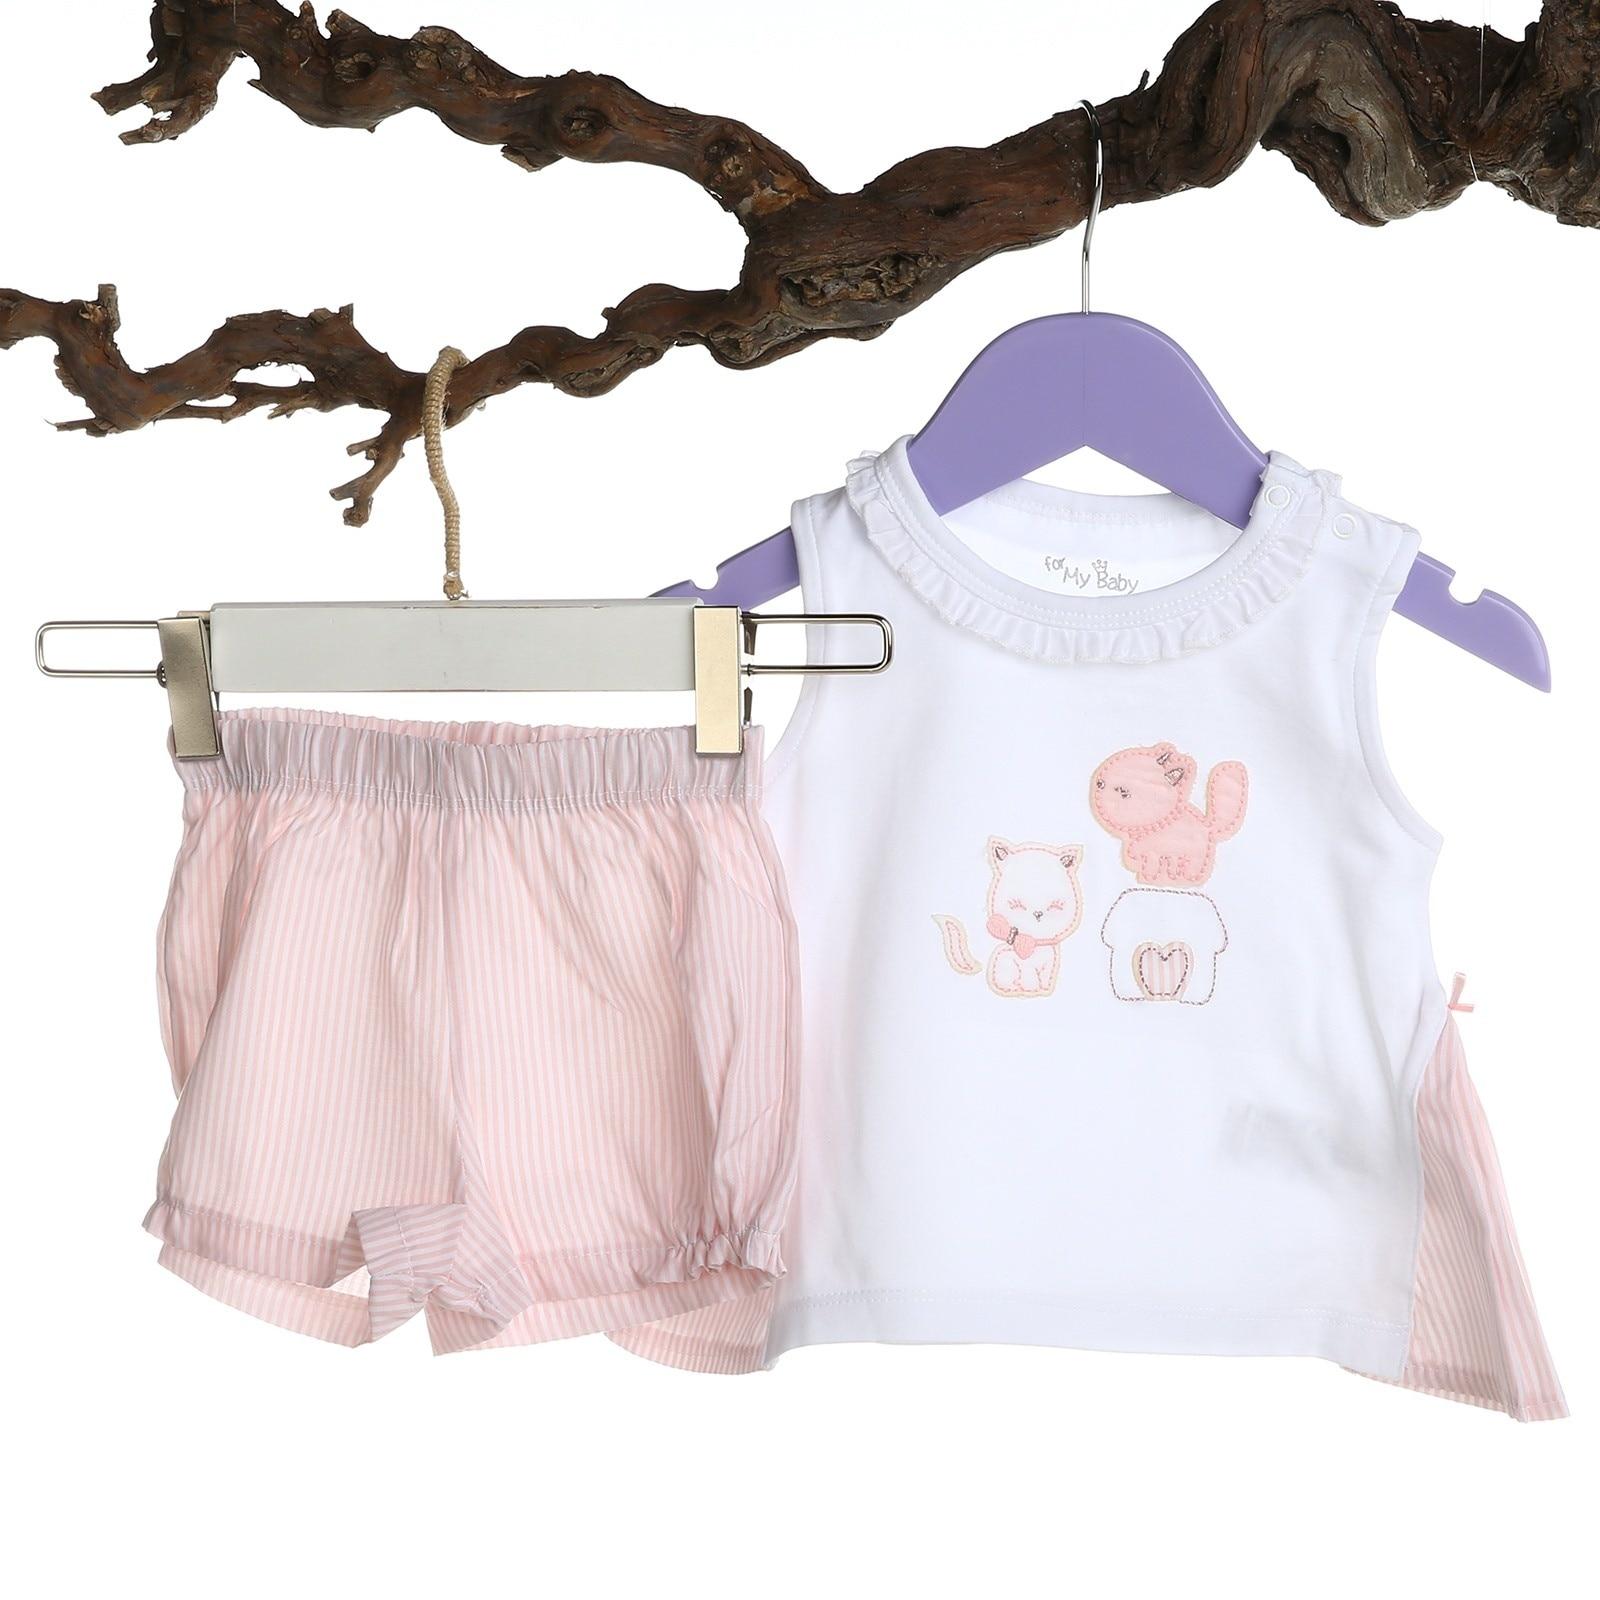 Ebebek For My Baby Girl Pink Ruffled Shirt Short Set